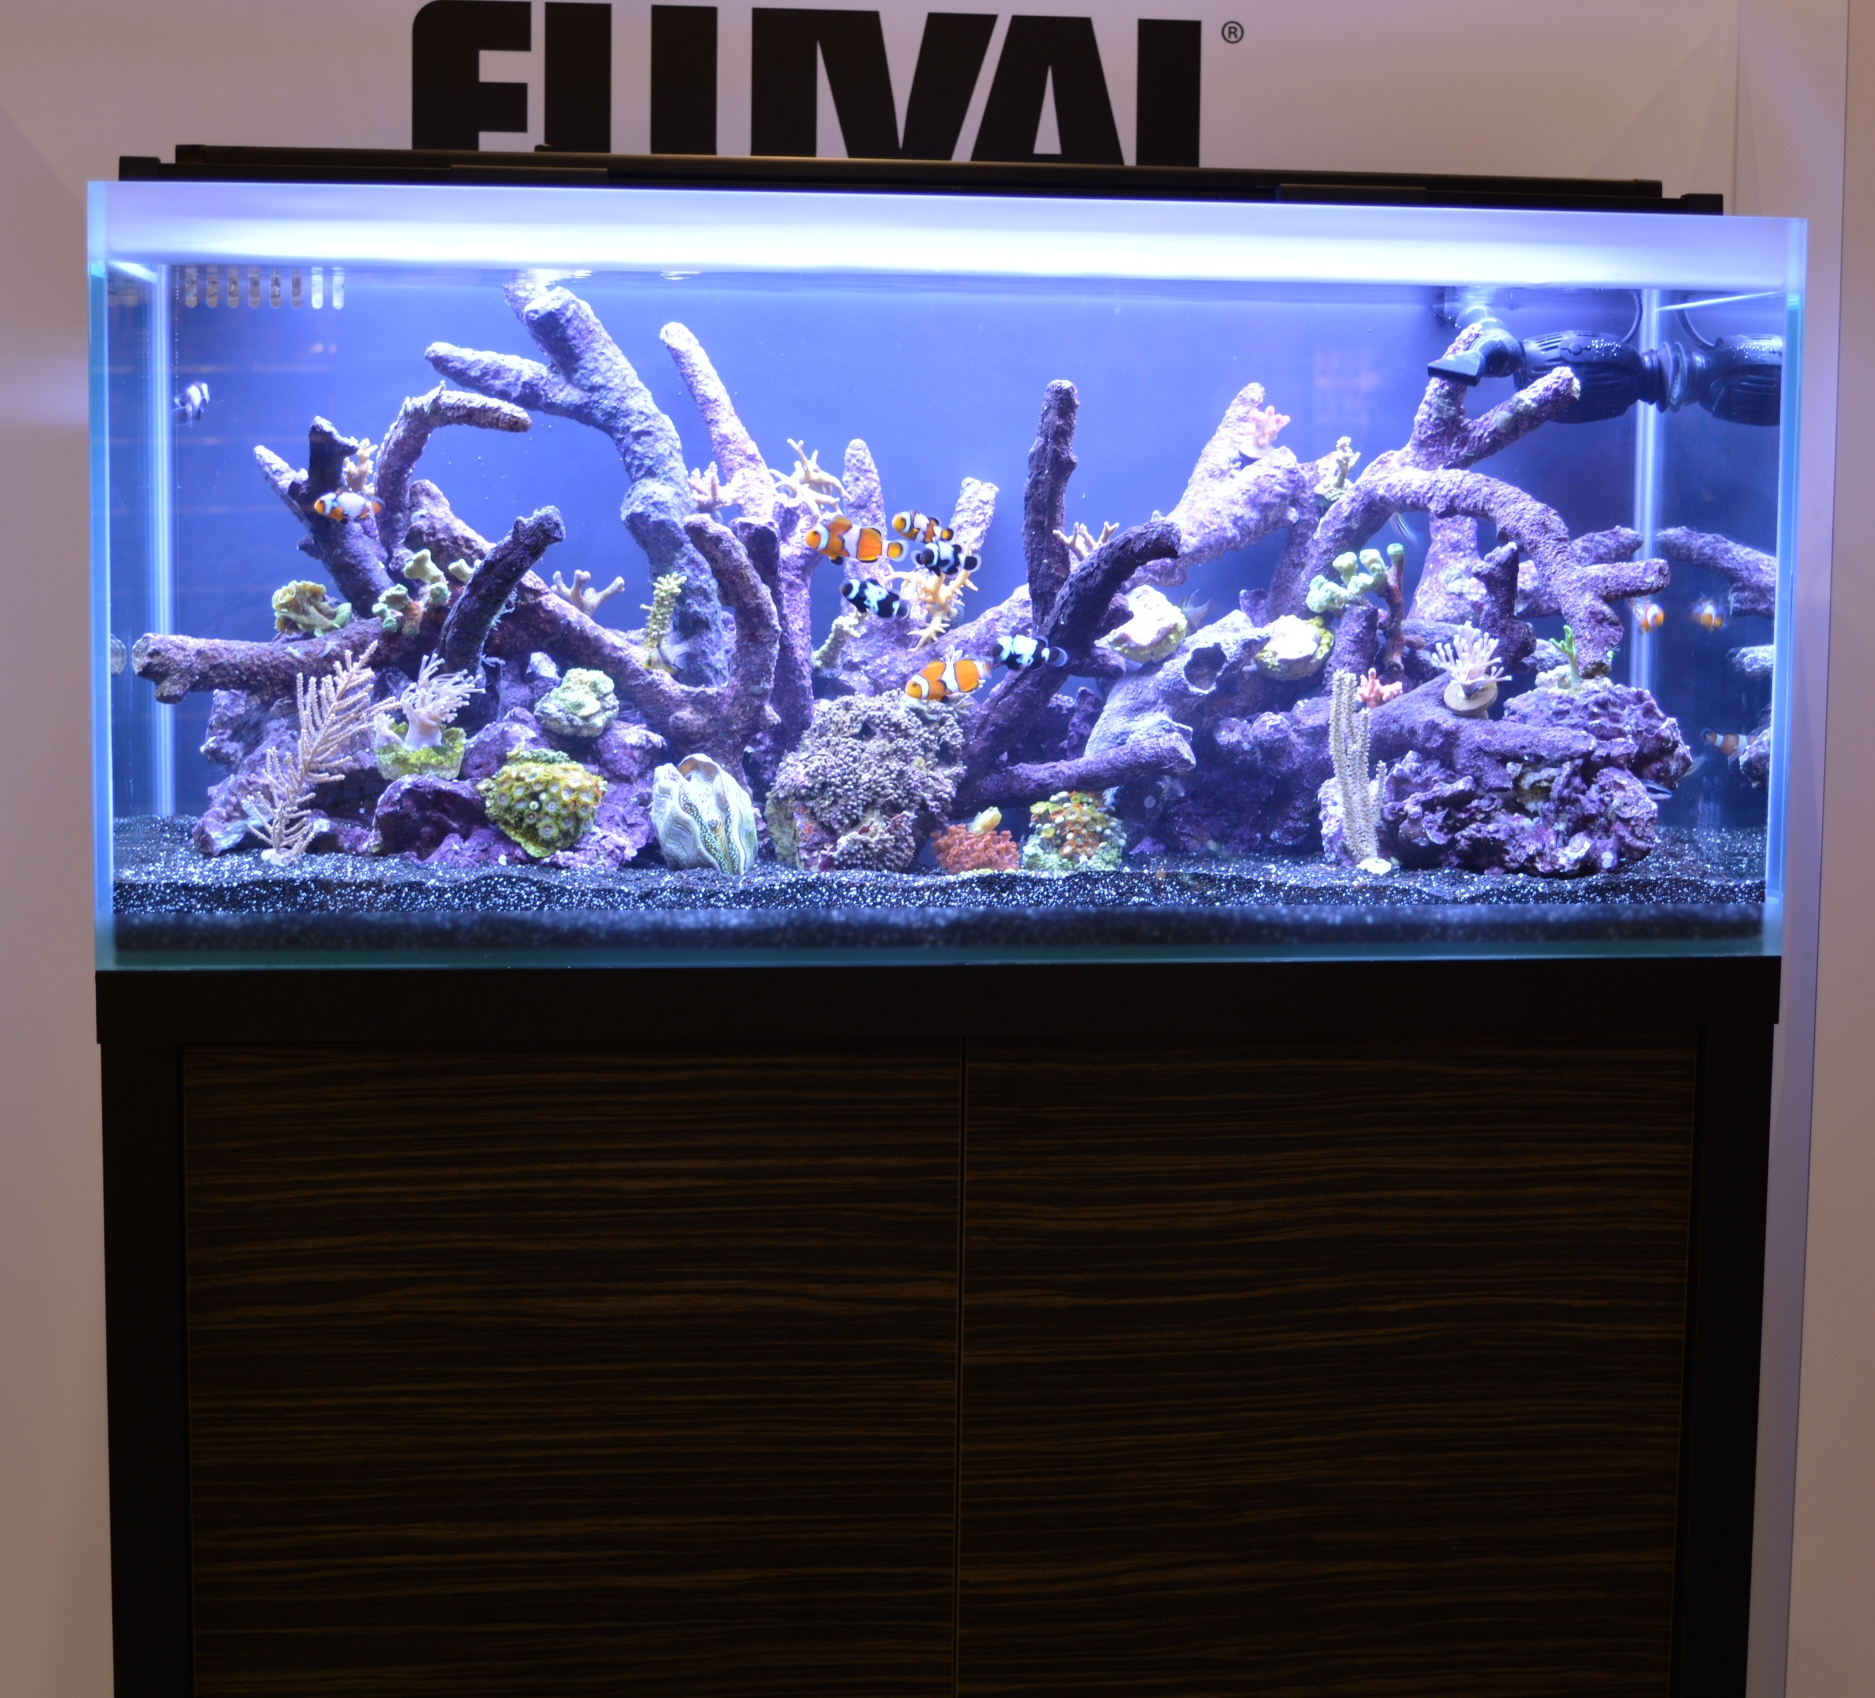 german led threads image displays content s proxy com farm atlantik lighting light beautiful store lights aquarium coral